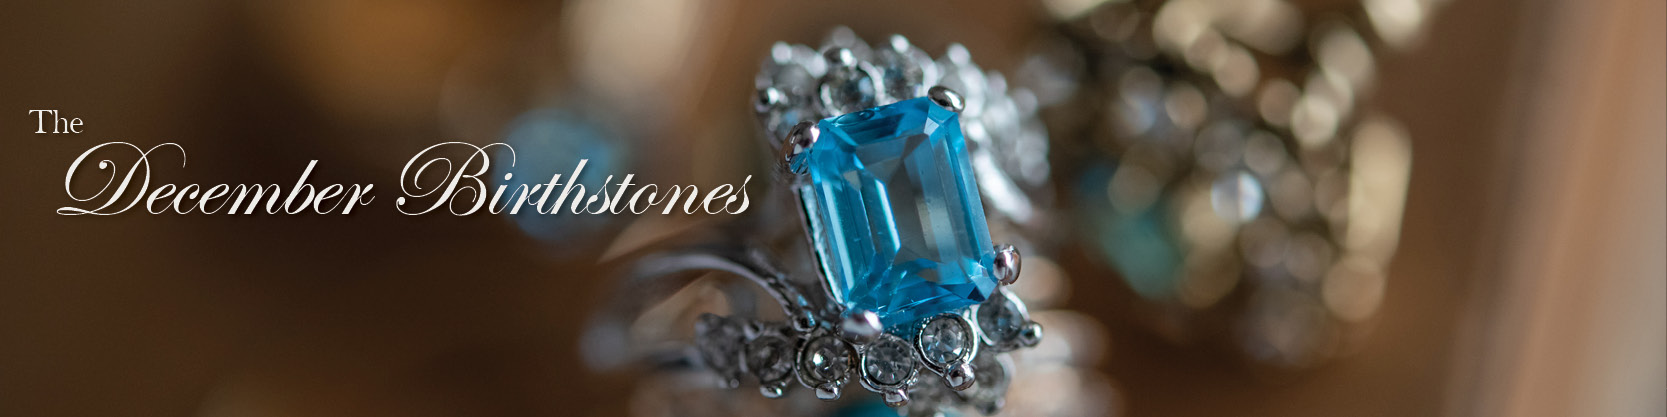 December birthstone vintage turquoise, blue zircon, blue topaz, and tanzanite rings - cubic zirconia - clear Swarovski crystals